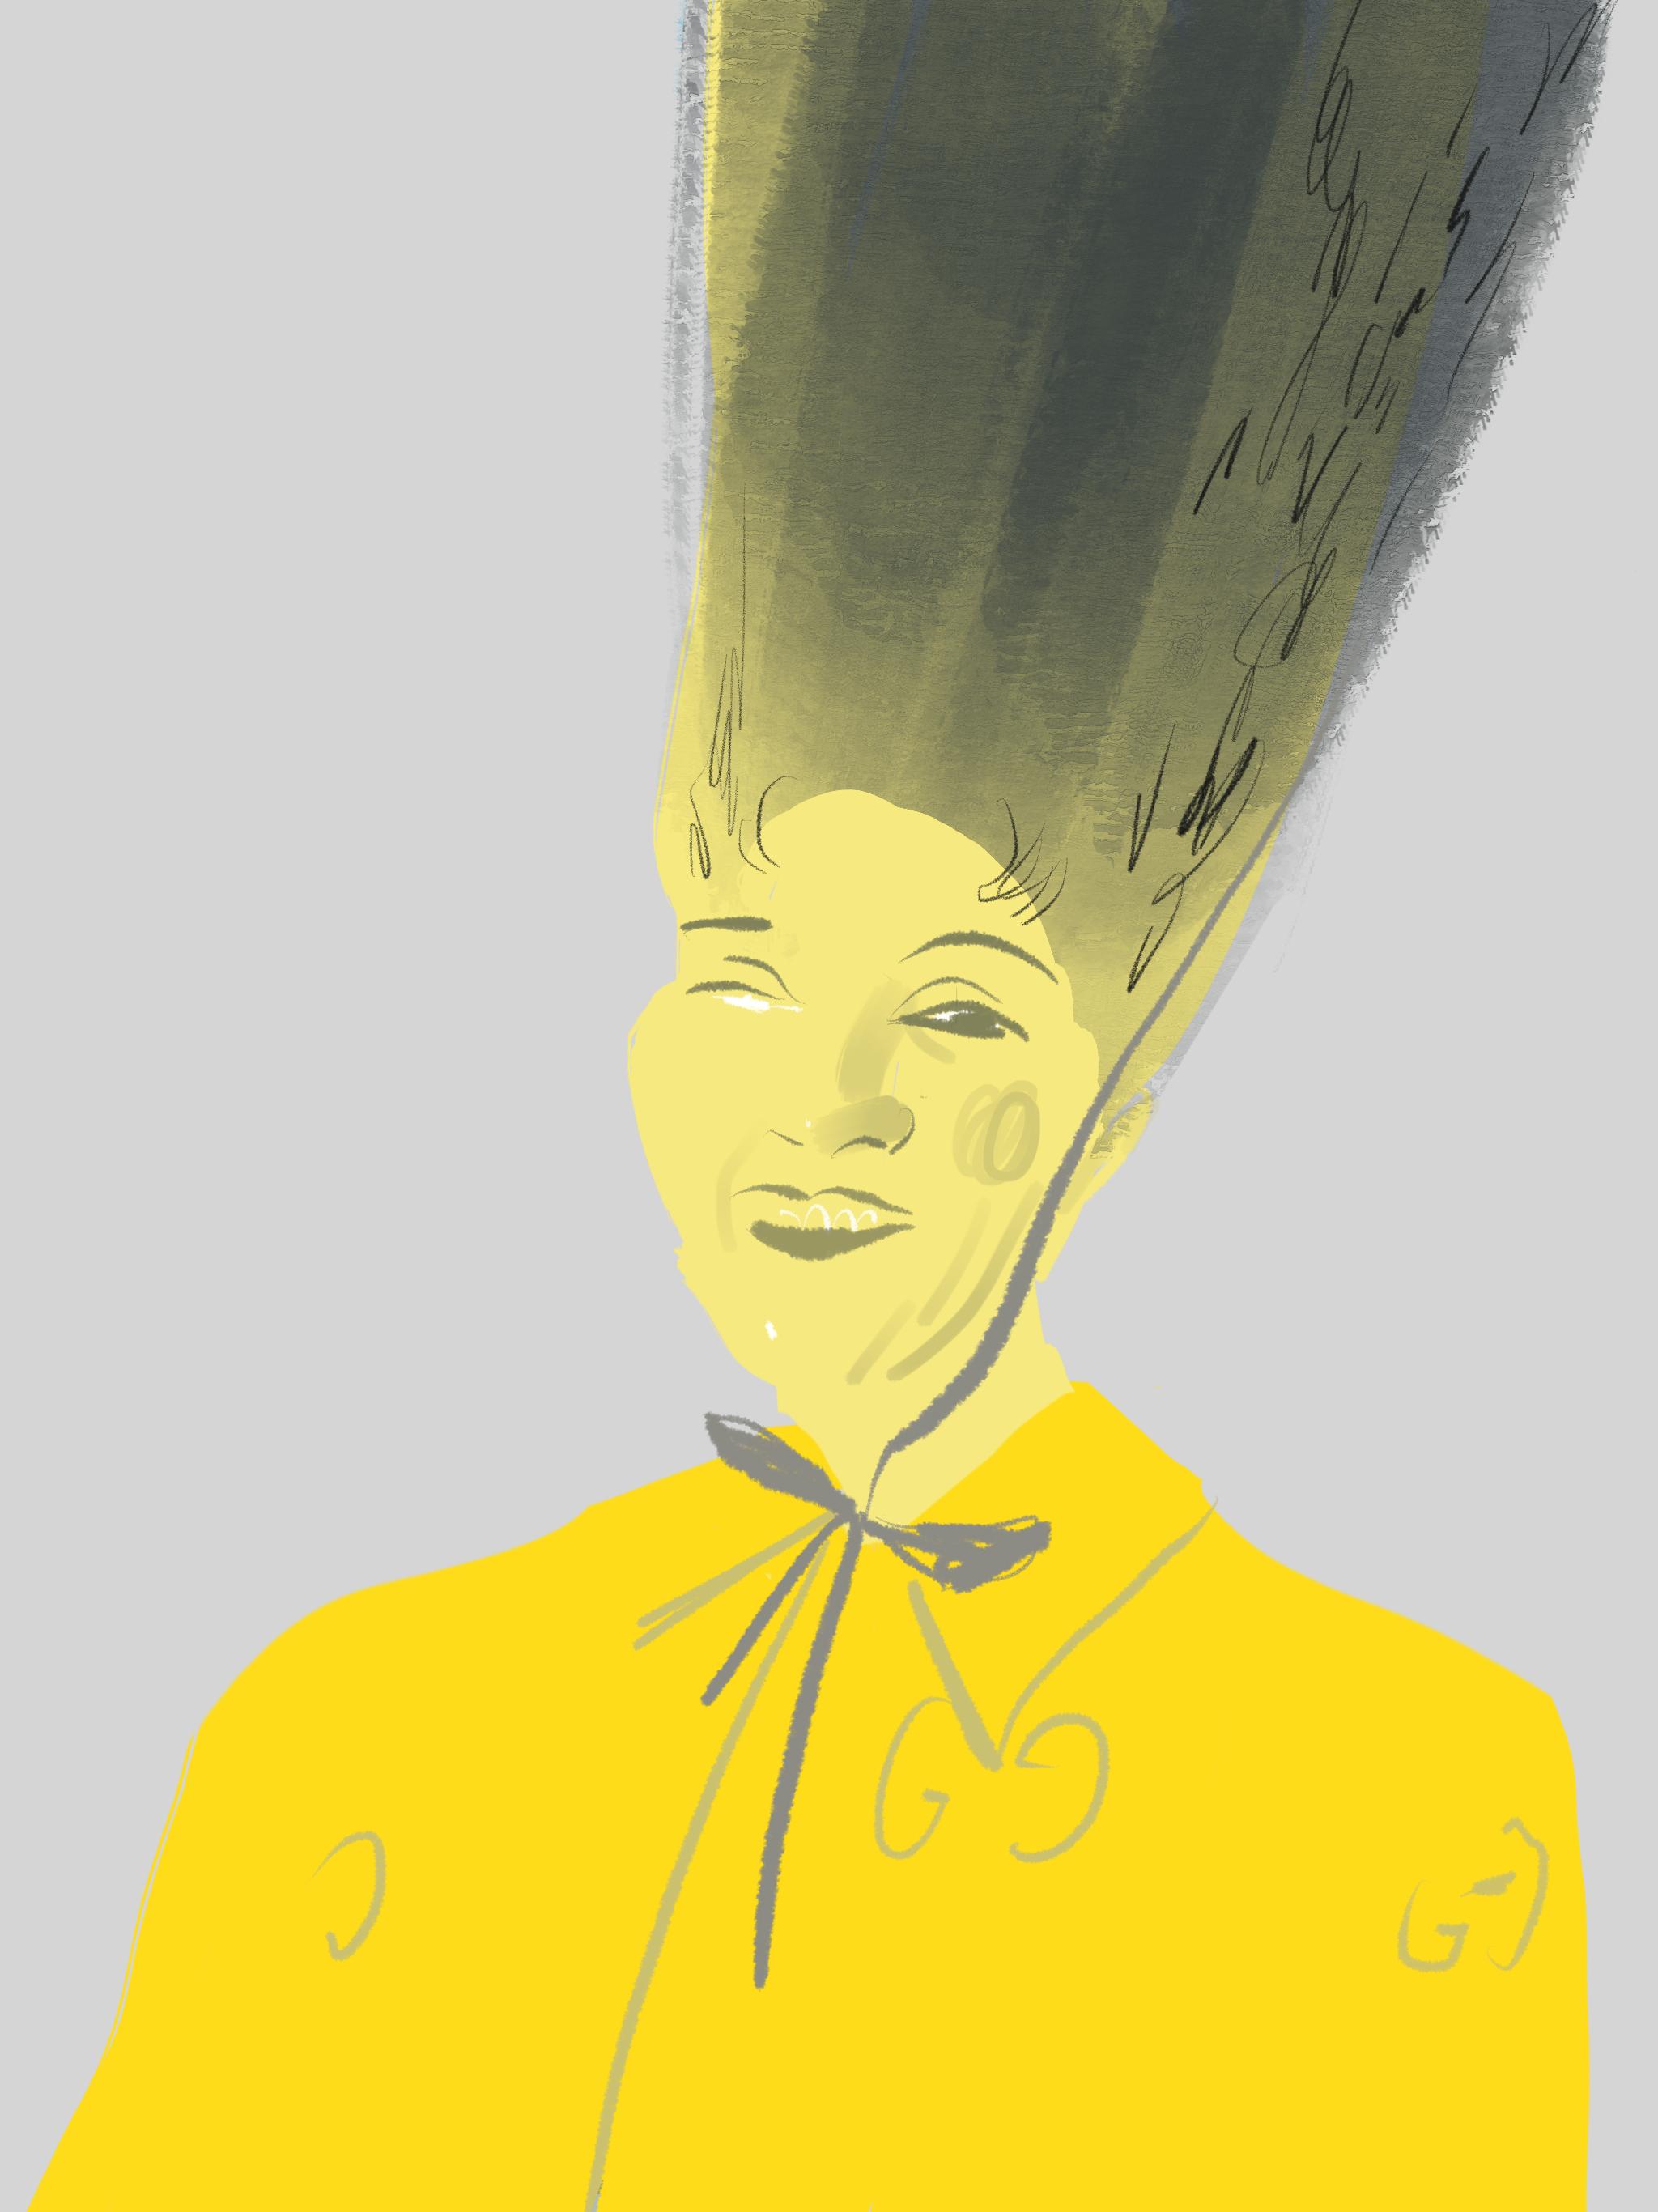 Hairstyle, Beauty Illustration by Silvana Mariani